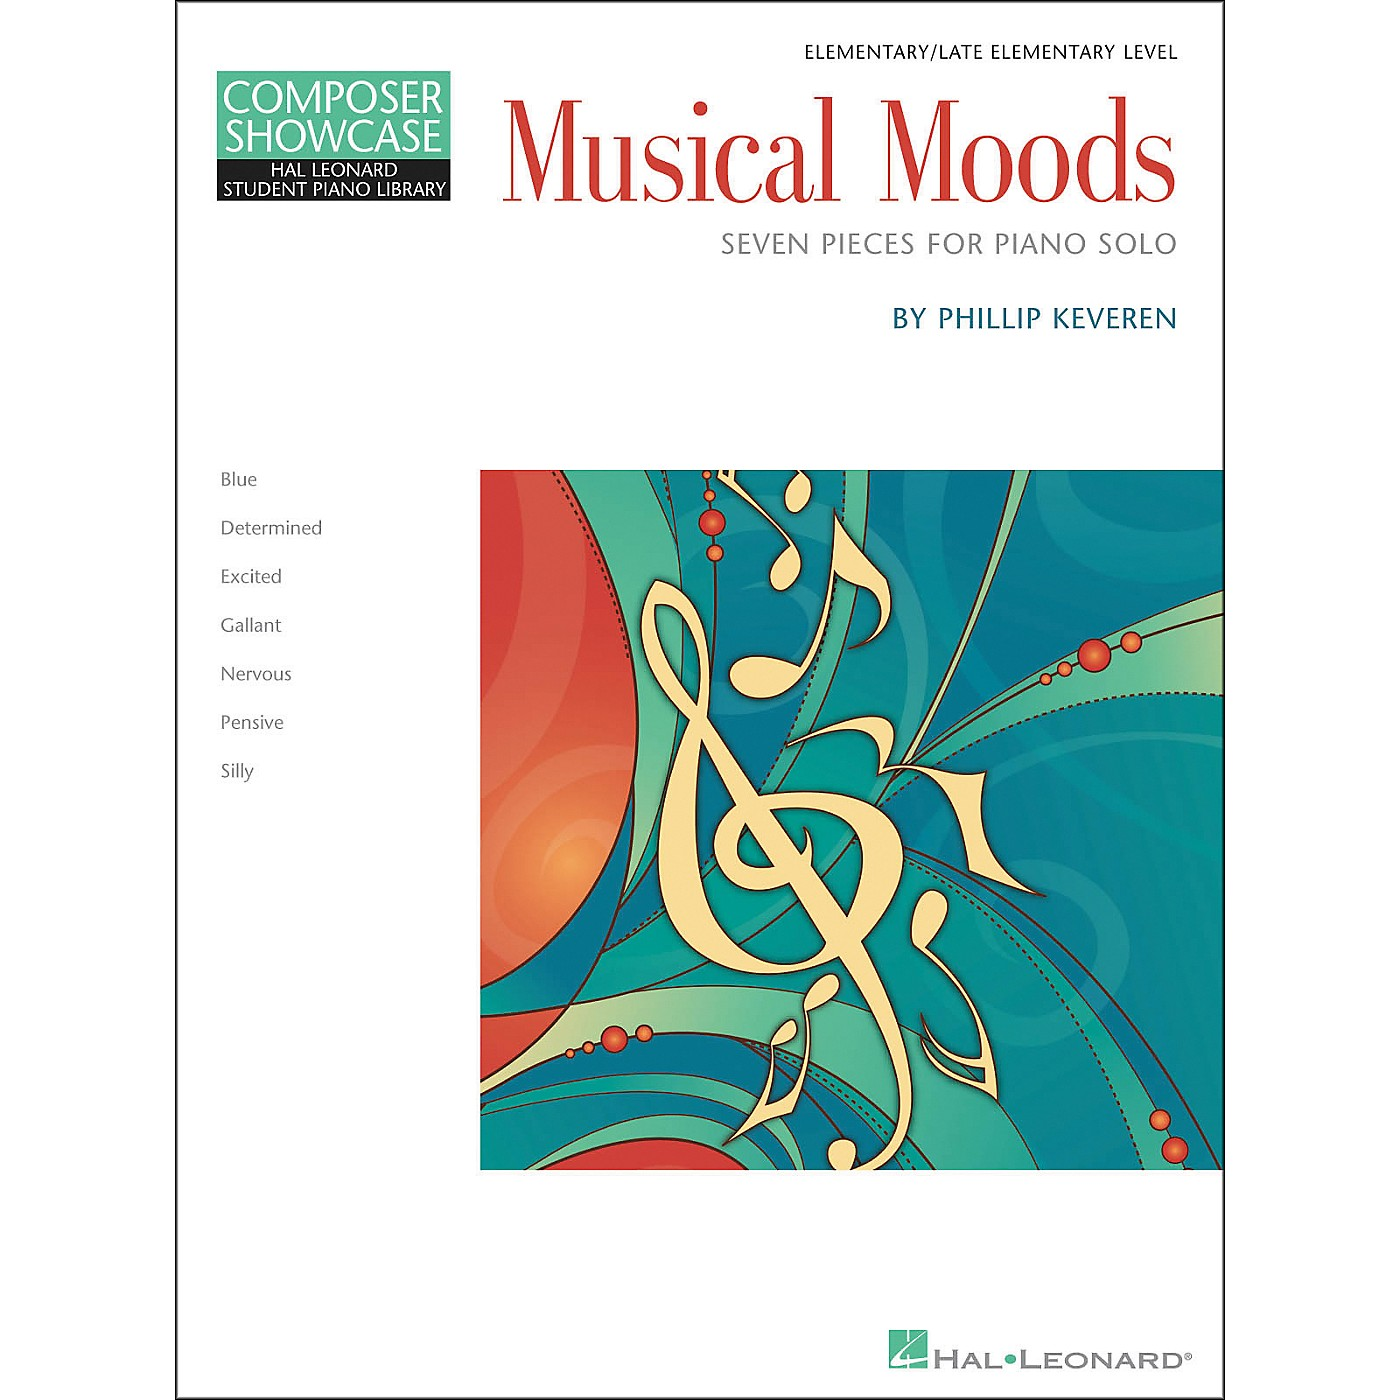 Hal Leonard Musical Moods Elementary/Late Elementary Level Composer Showcase Hal Leonard Student Piano Library by Phillip Keveren thumbnail